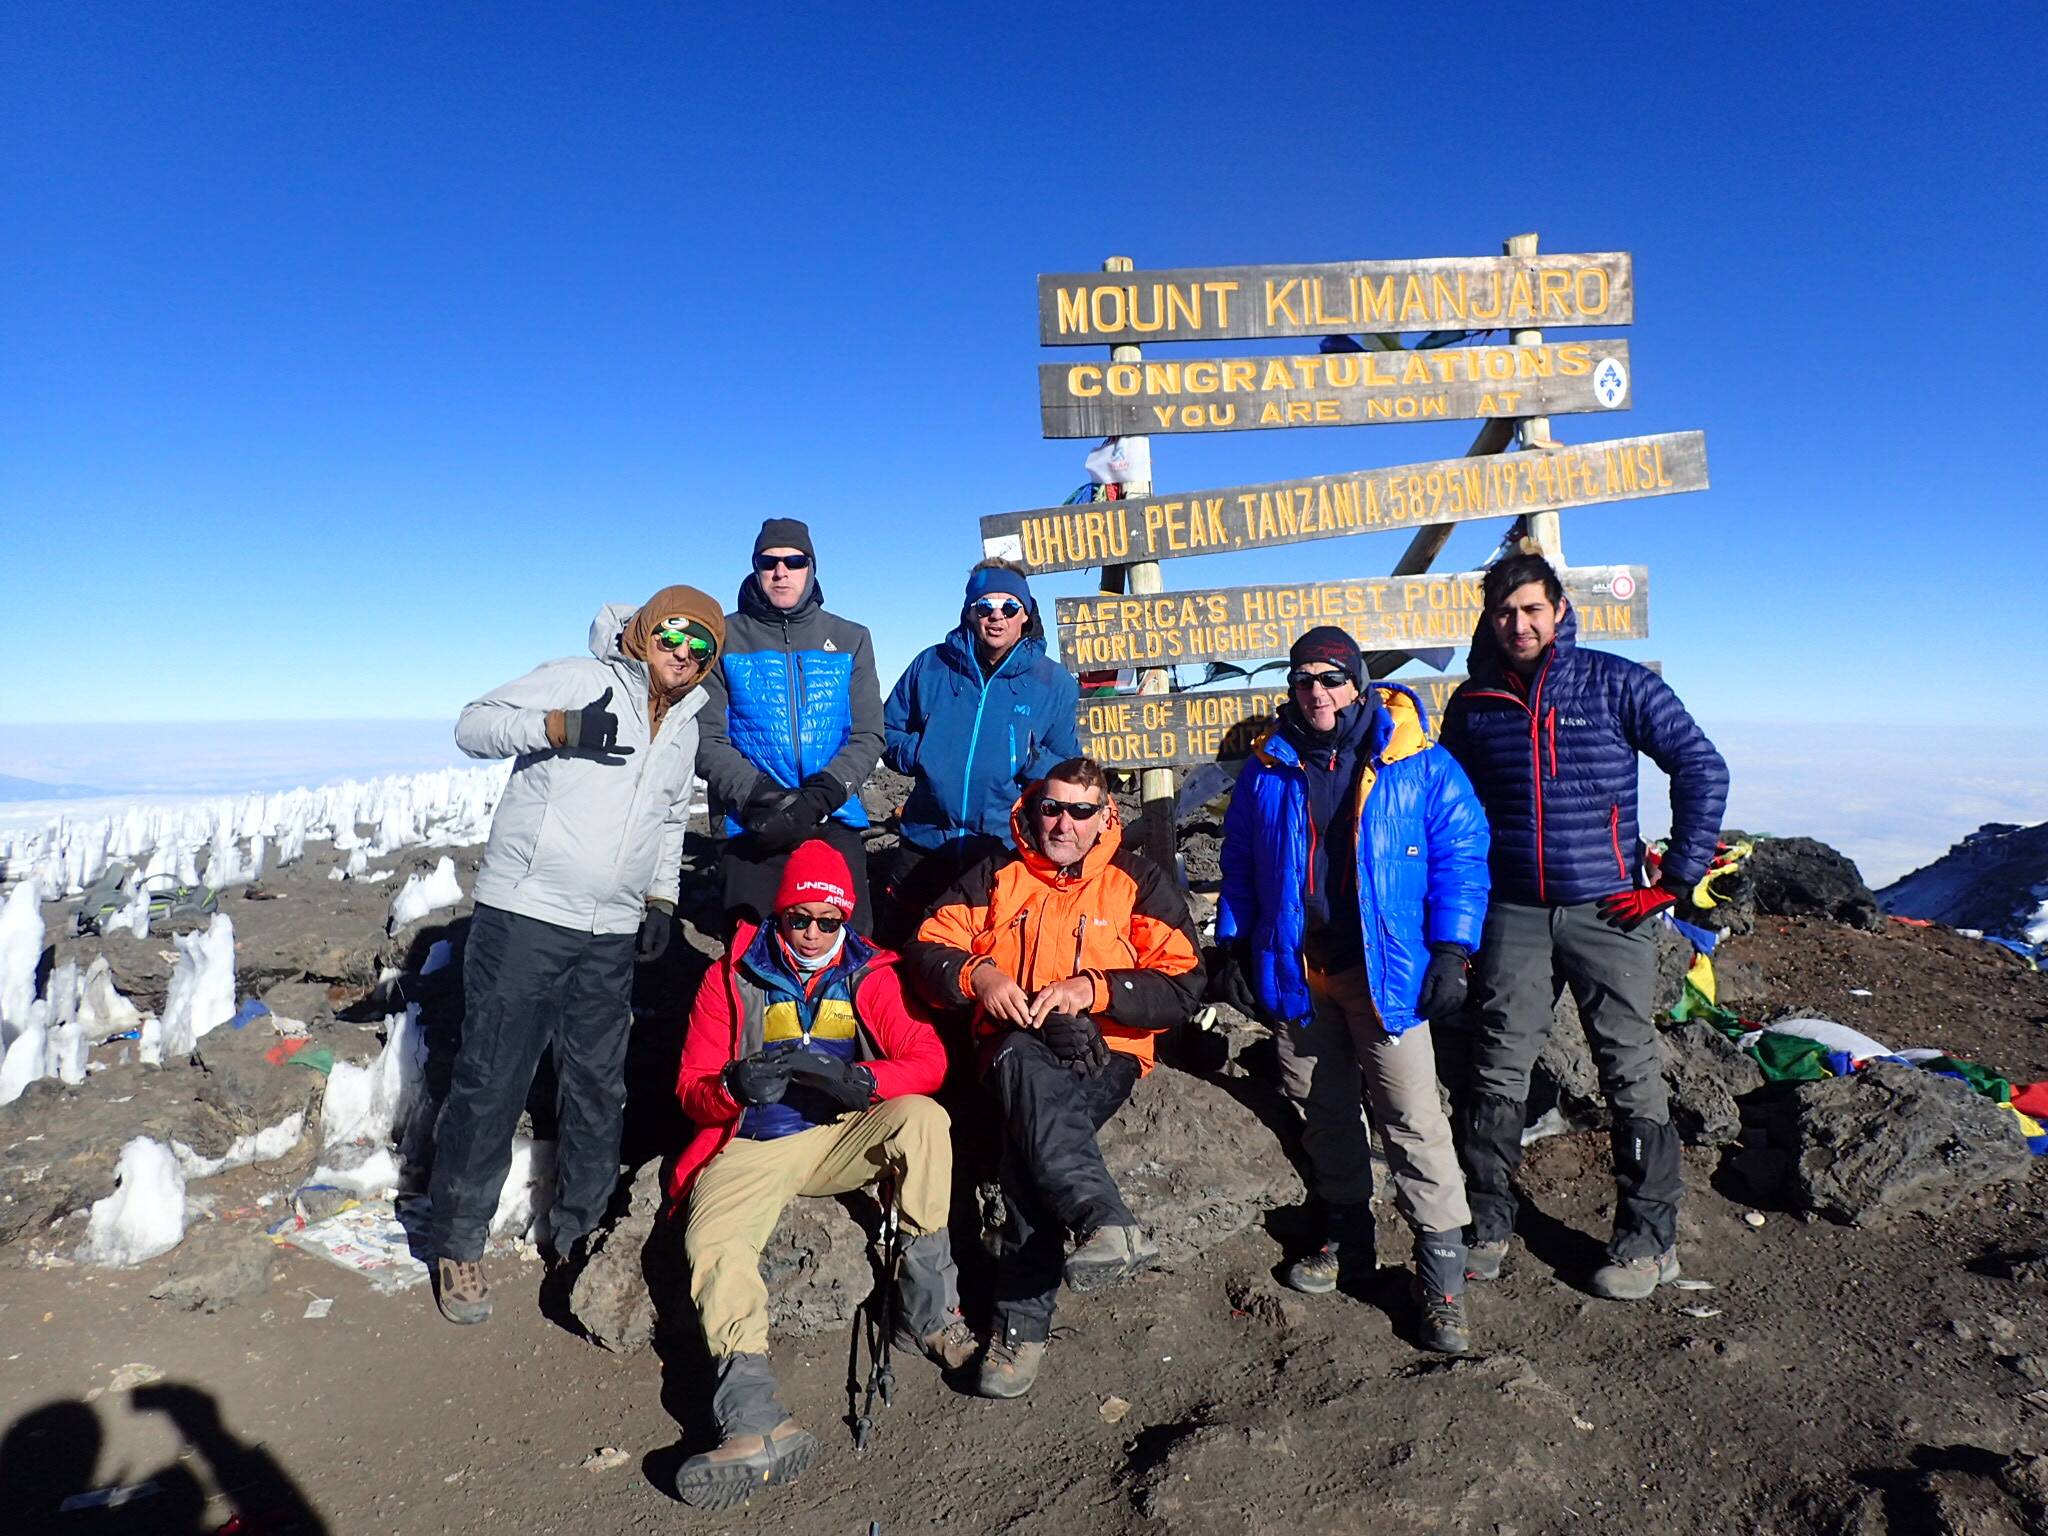 mountaineering path